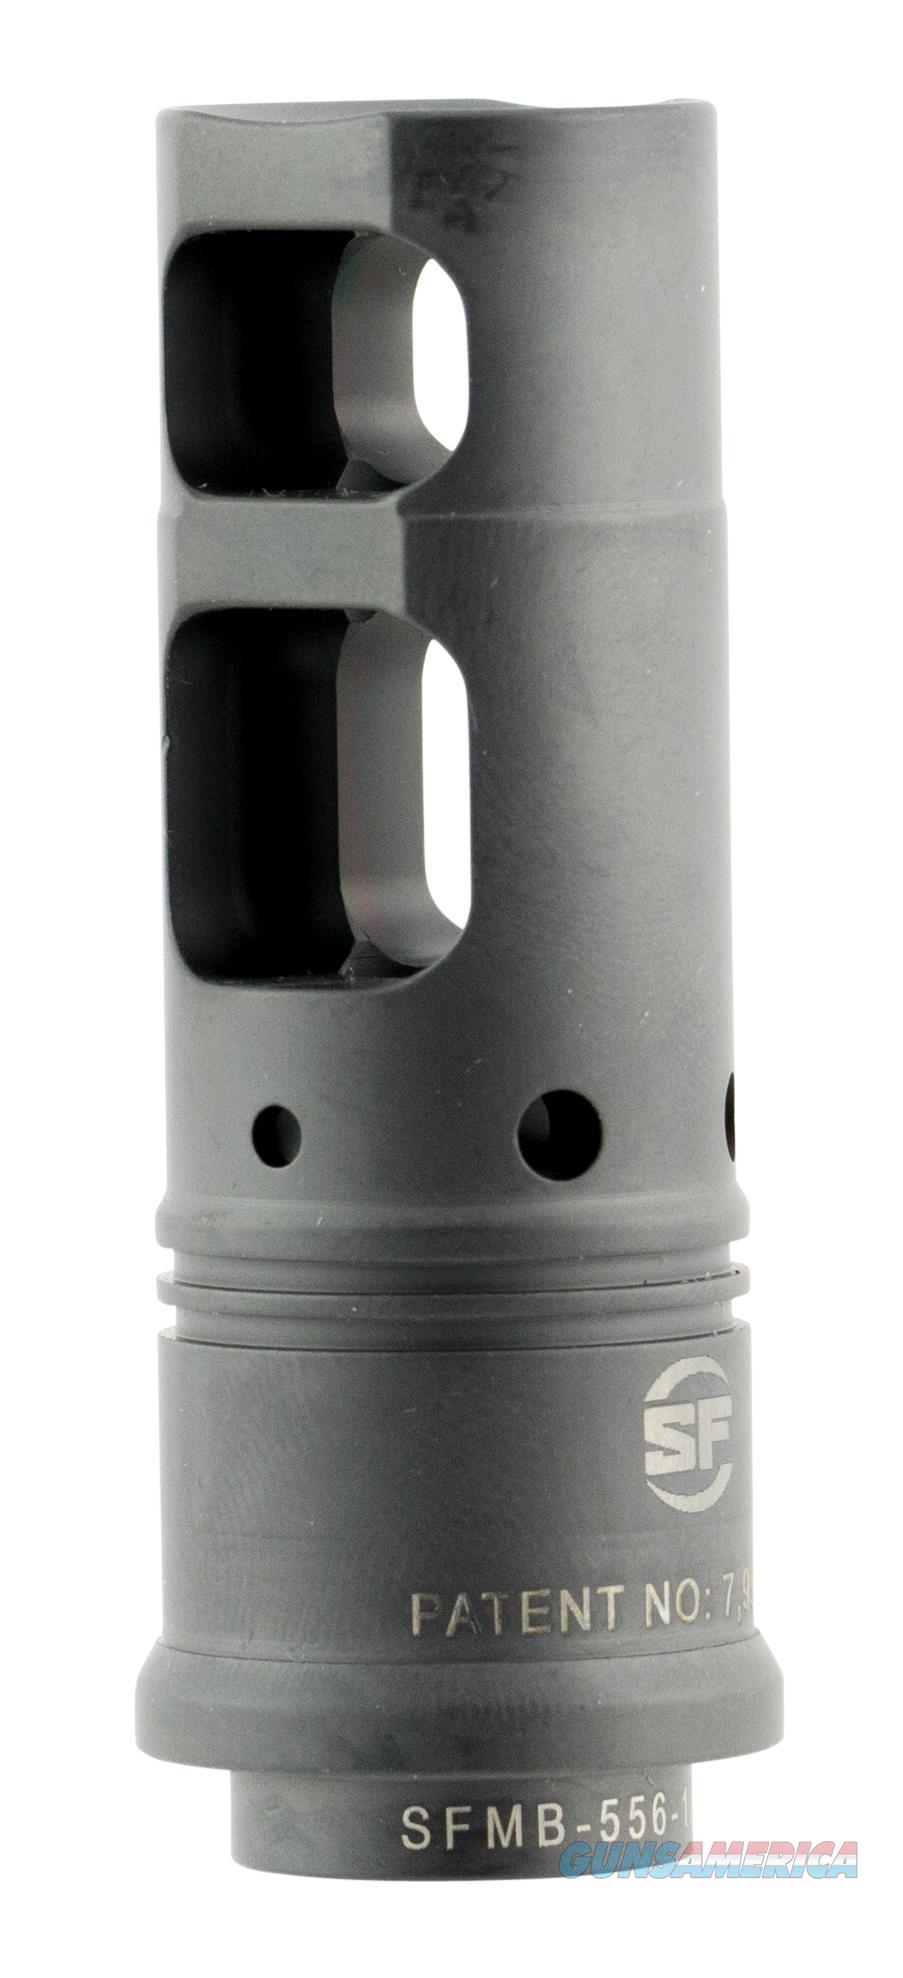 "Surefire Sfmb556 Suppressor Adapter Muzzle Brake M16/M4 5.56Mm Stainless Steel 2.7"" SFMB556  Non-Guns > Gun Parts > Misc > Rifles"